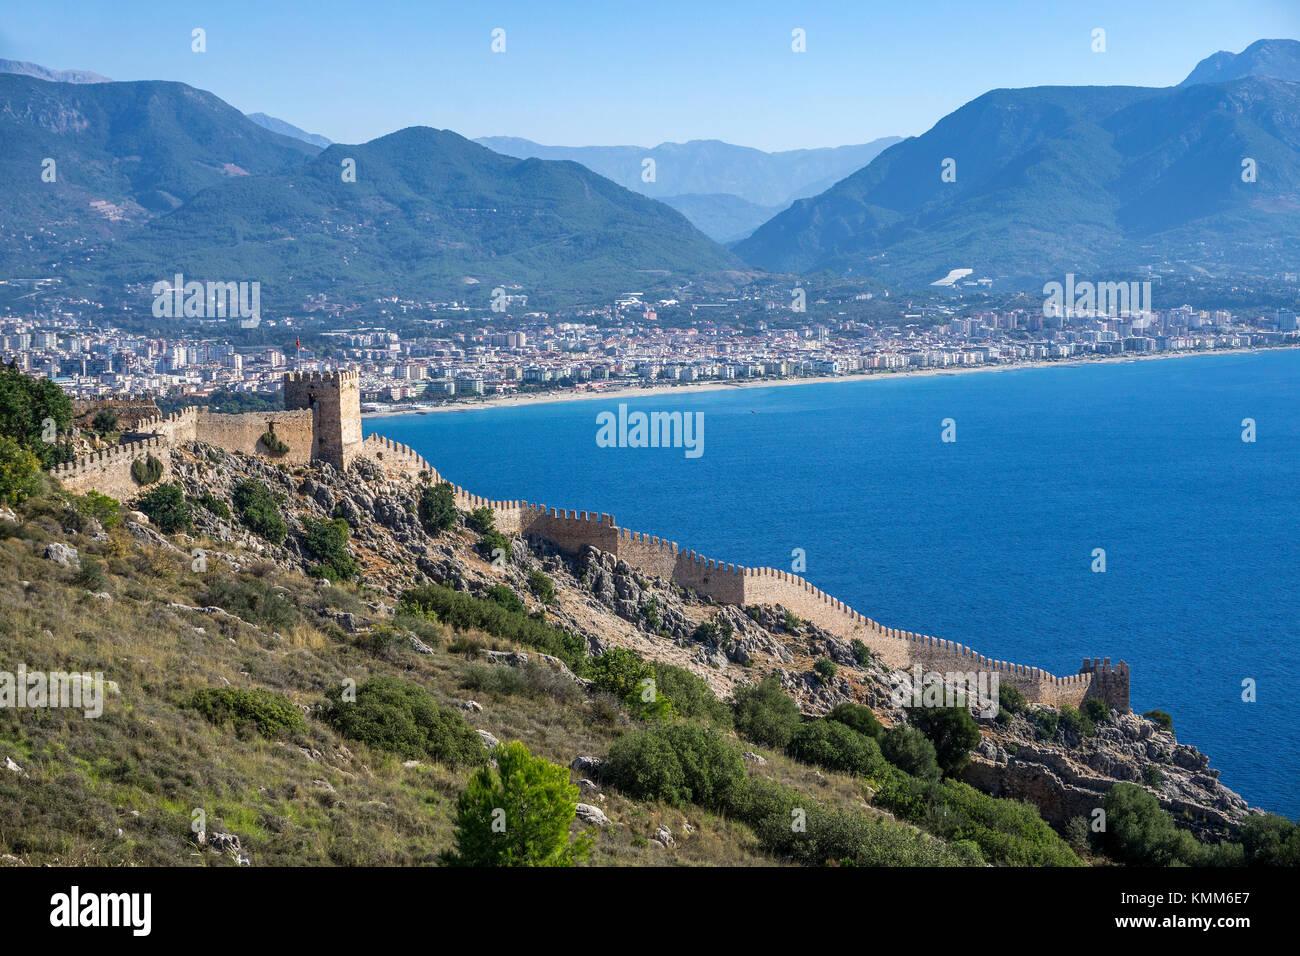 Fortress of Alanya, turkish riviera, Turkey - Stock Image